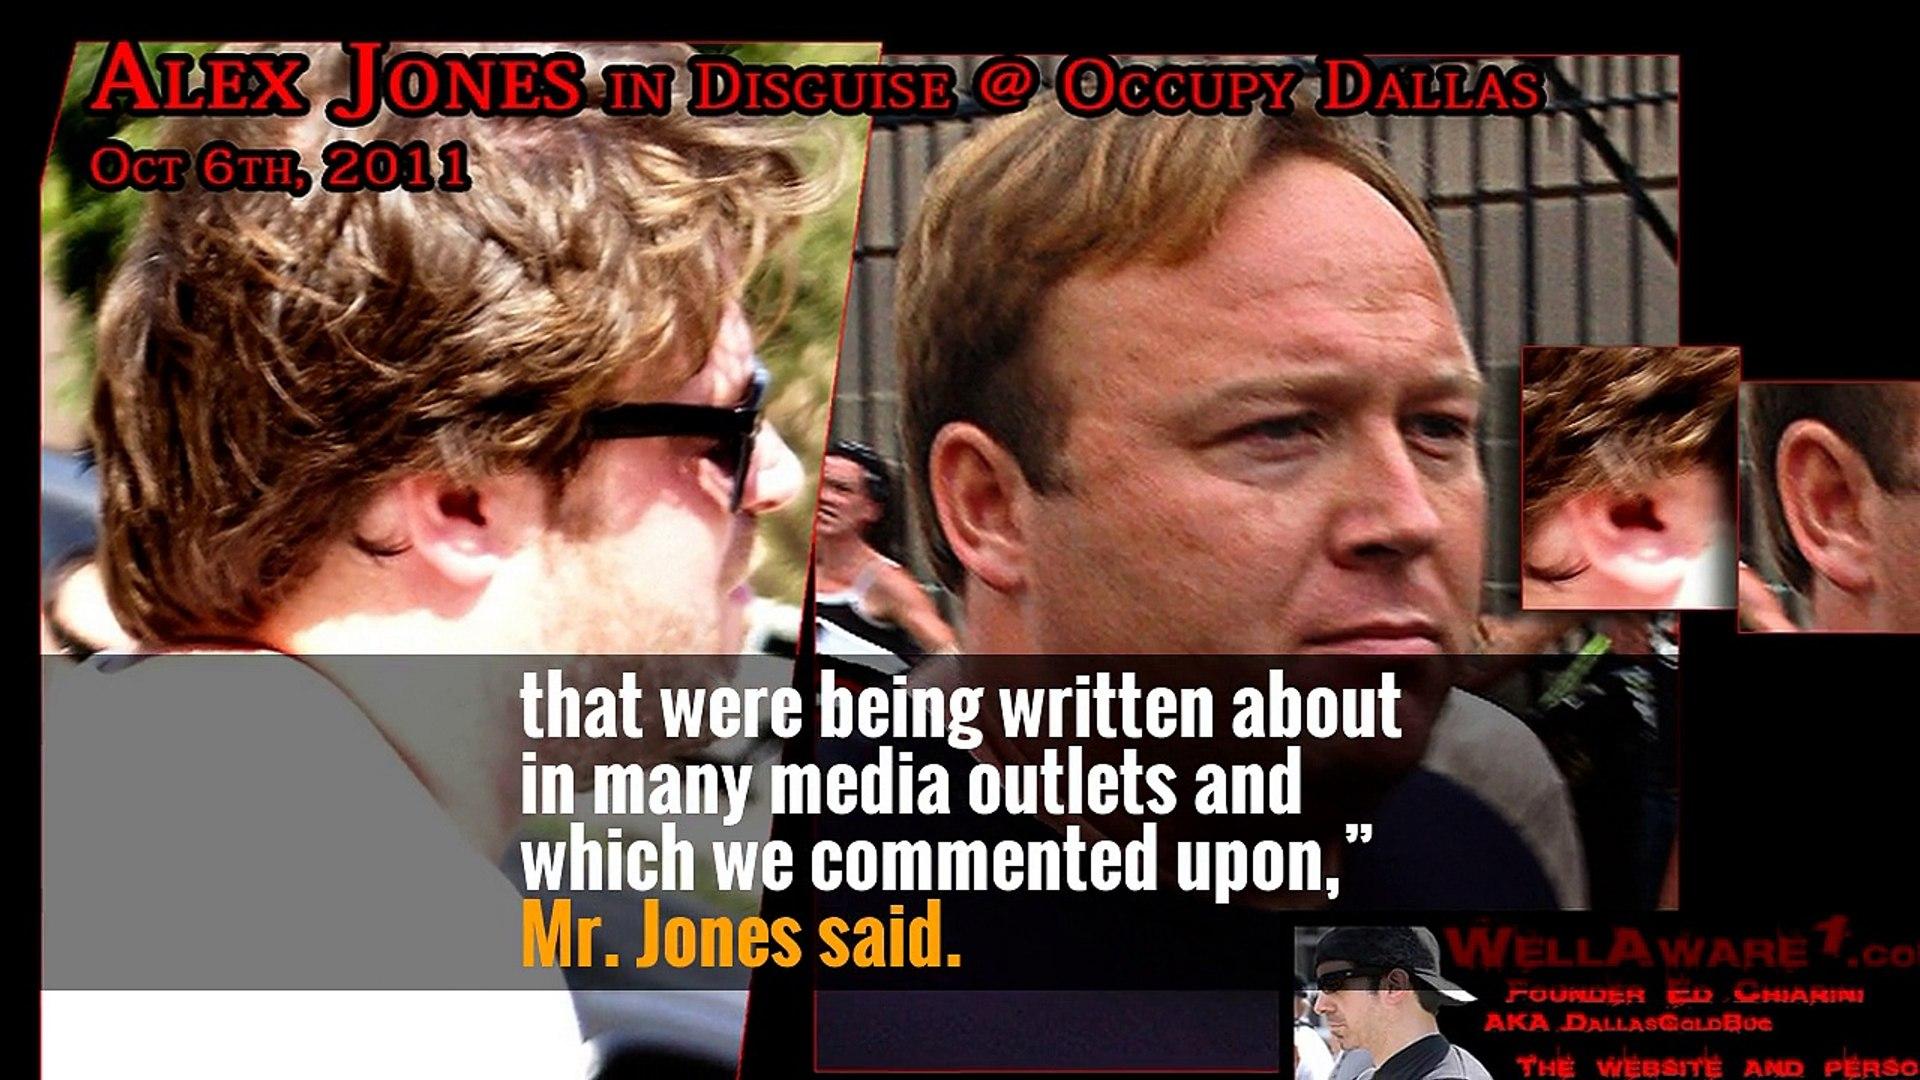 Alex Jones Apologizes for Promoting 'Pizzagate' Hoax -